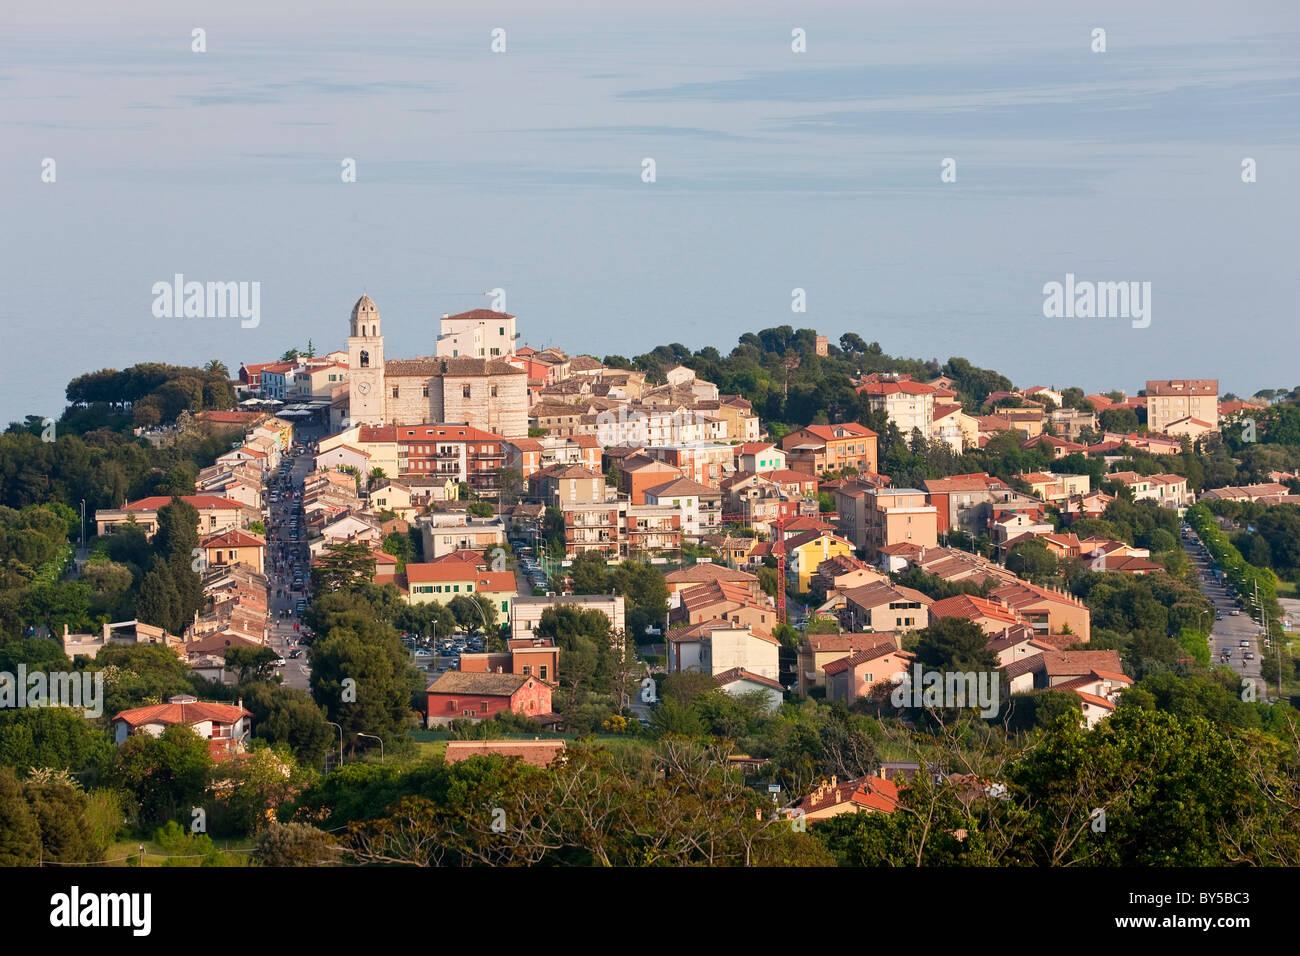 Sirolo, Marche, Italy - Stock Image